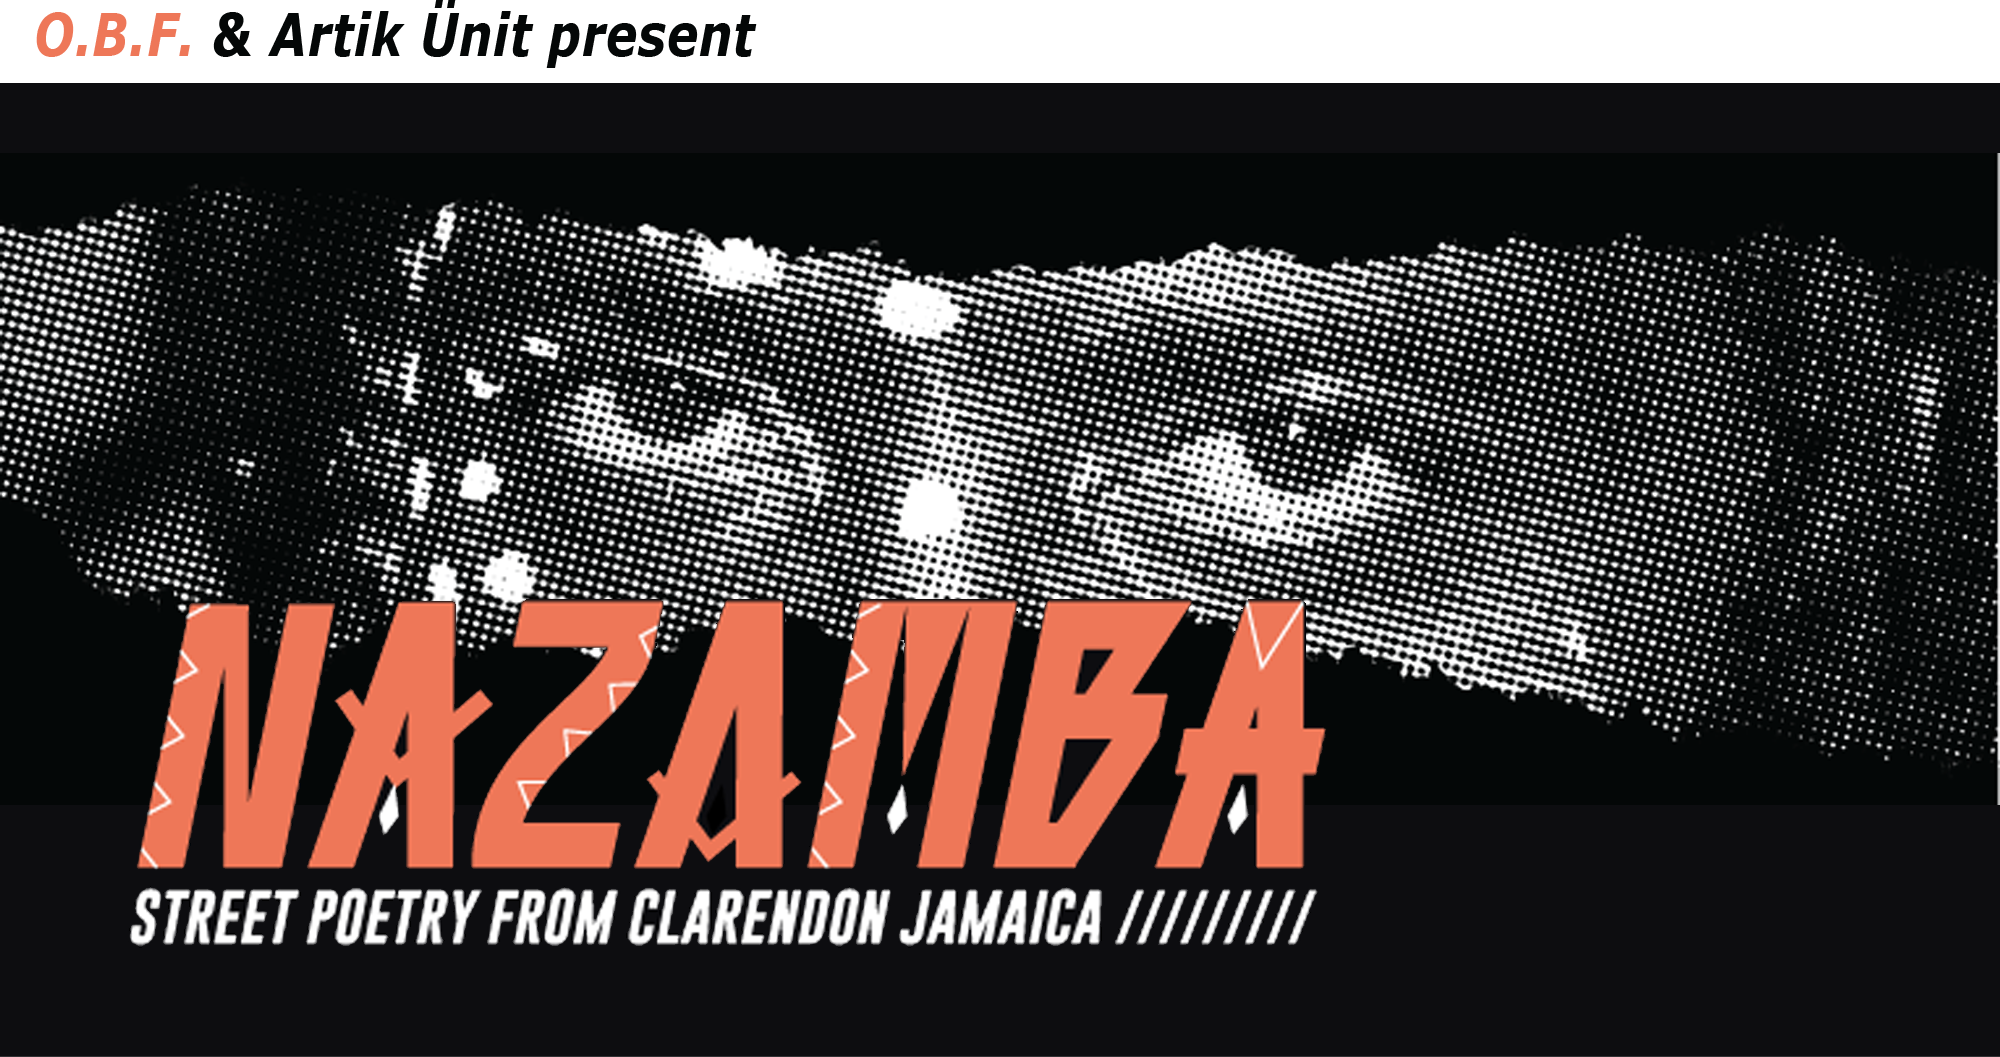 NAZAMBA new album and tour